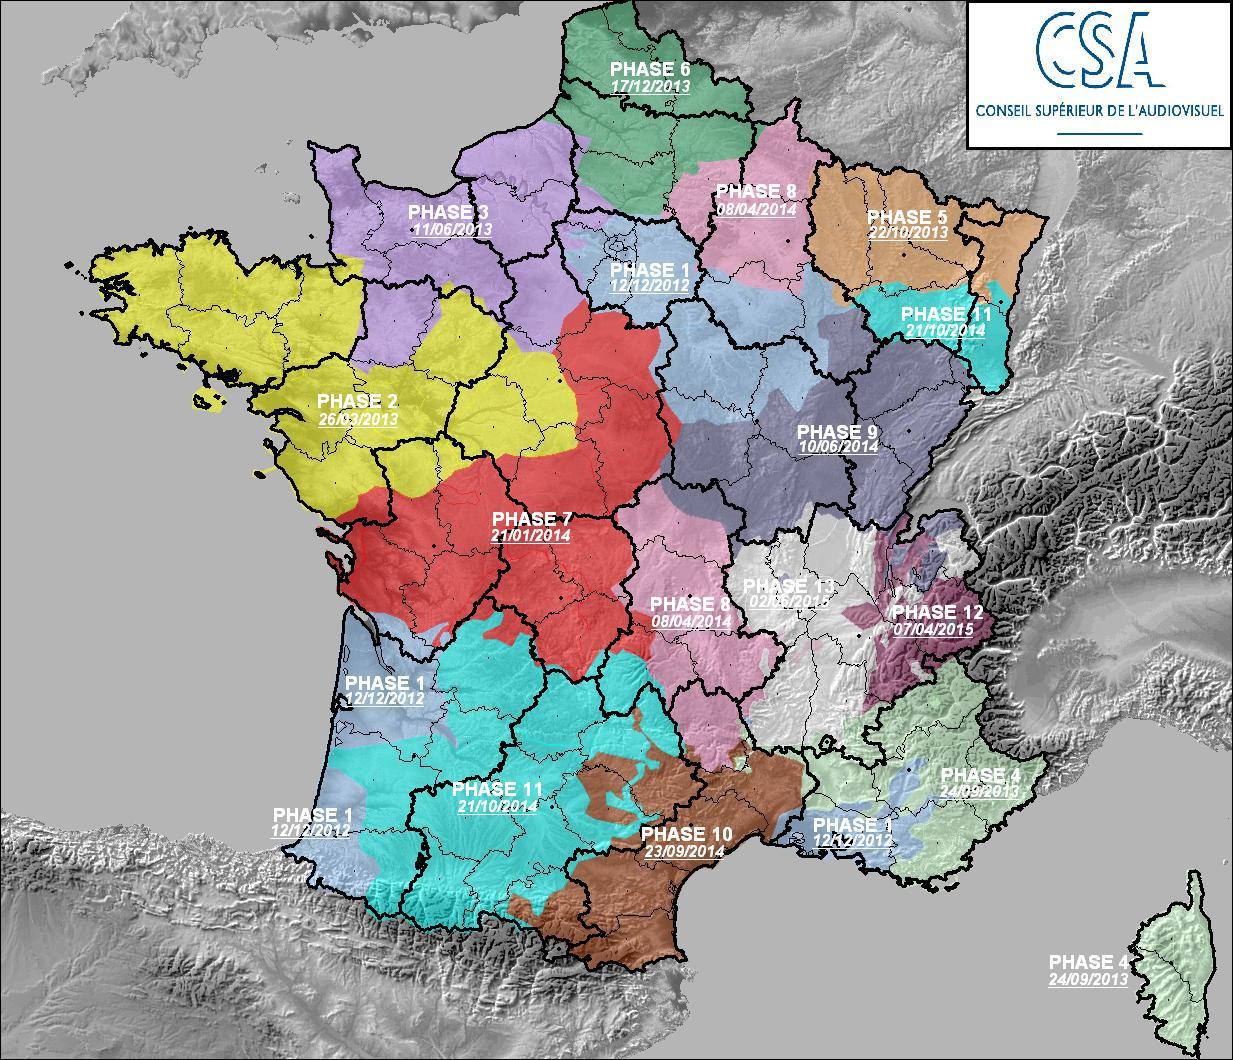 http://www.freenews.fr/IMG/jpg/carte-deploiement-R7-et-R8.jpg